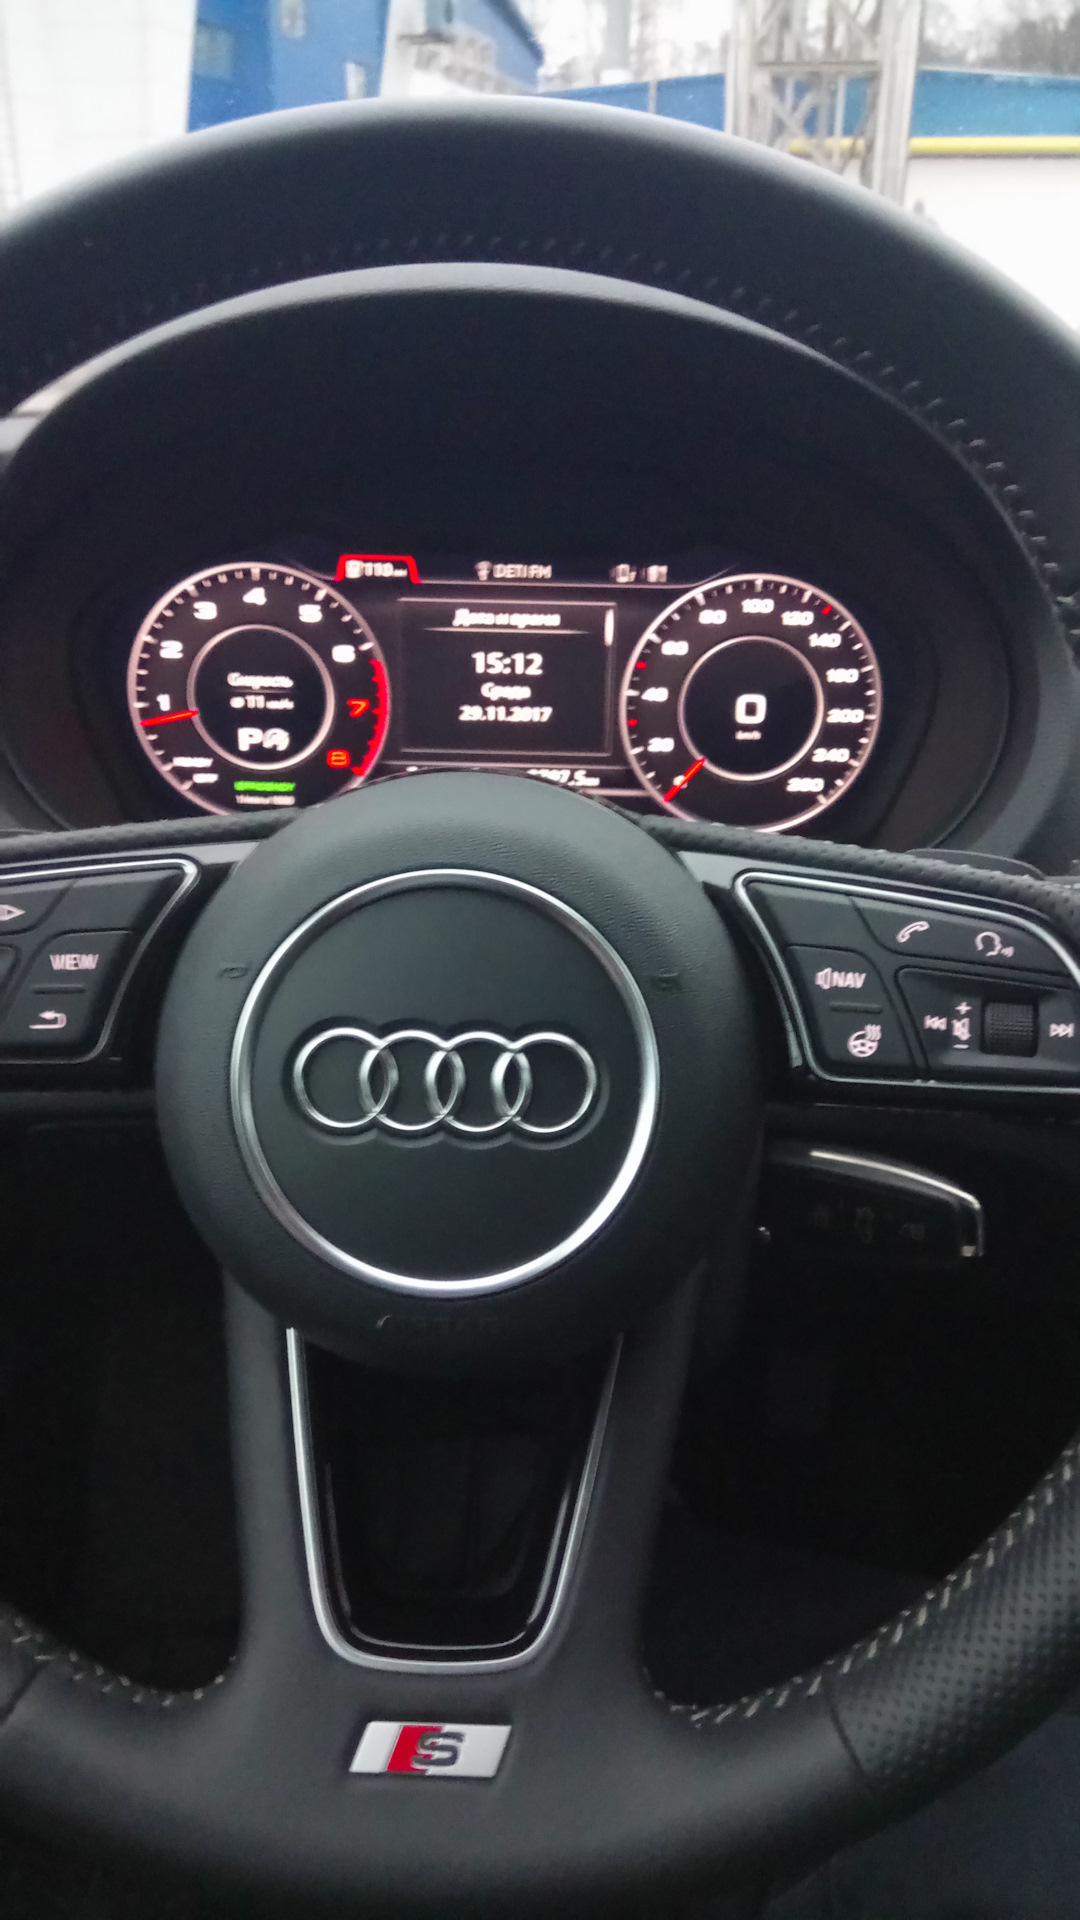 Audi A3 8v Virtual Cockpit